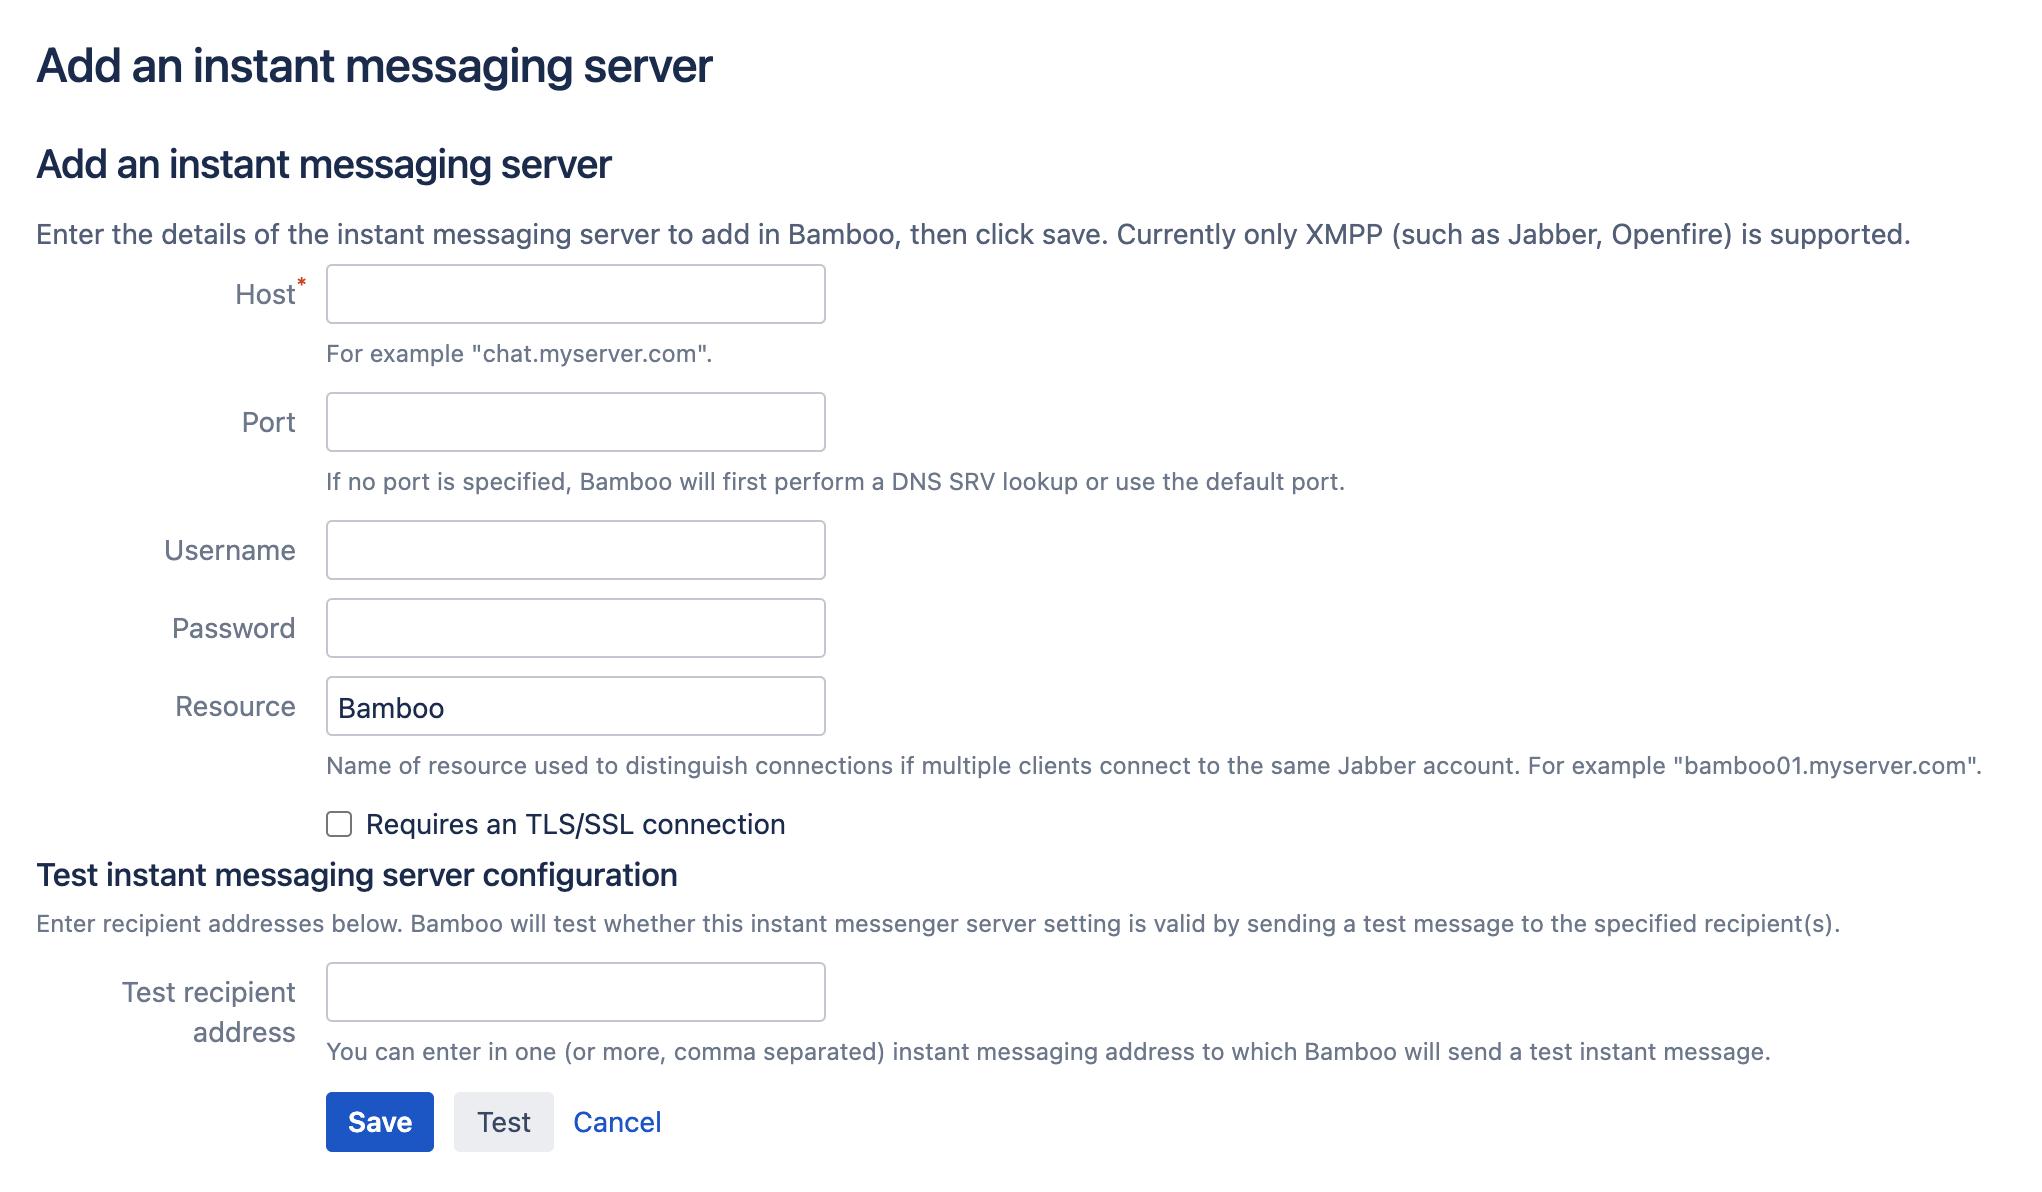 Instant messaging server configuration screen